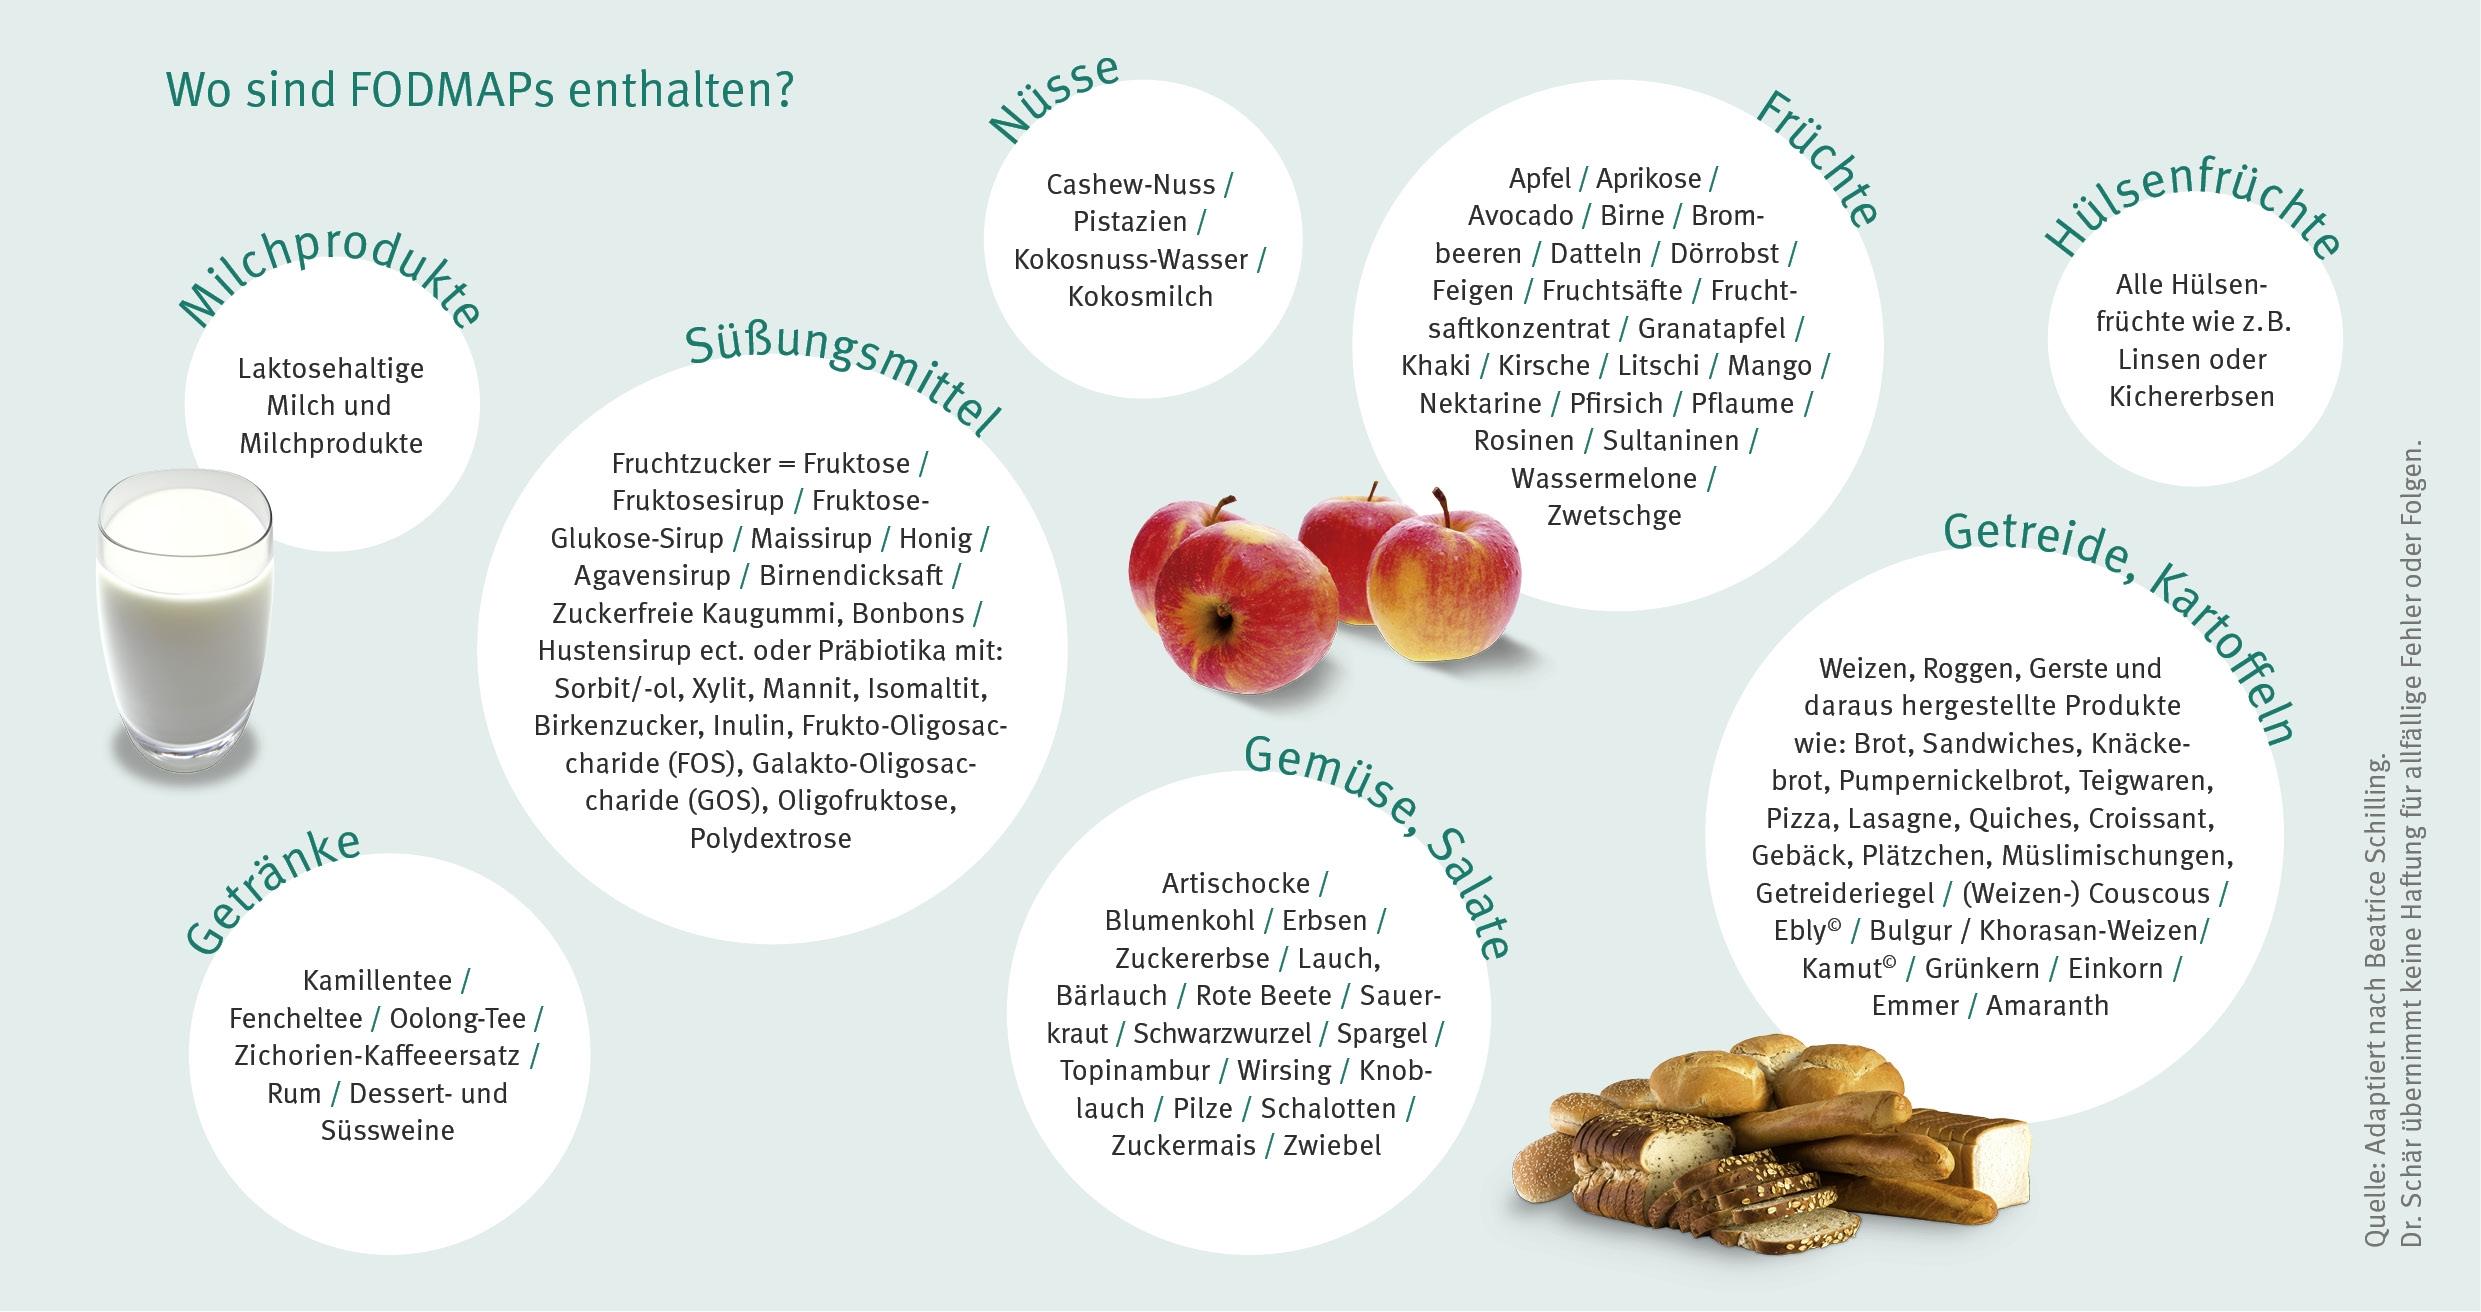 FODMAP-arme Ernährung bei Reizdarm - Dr. Schär Institute